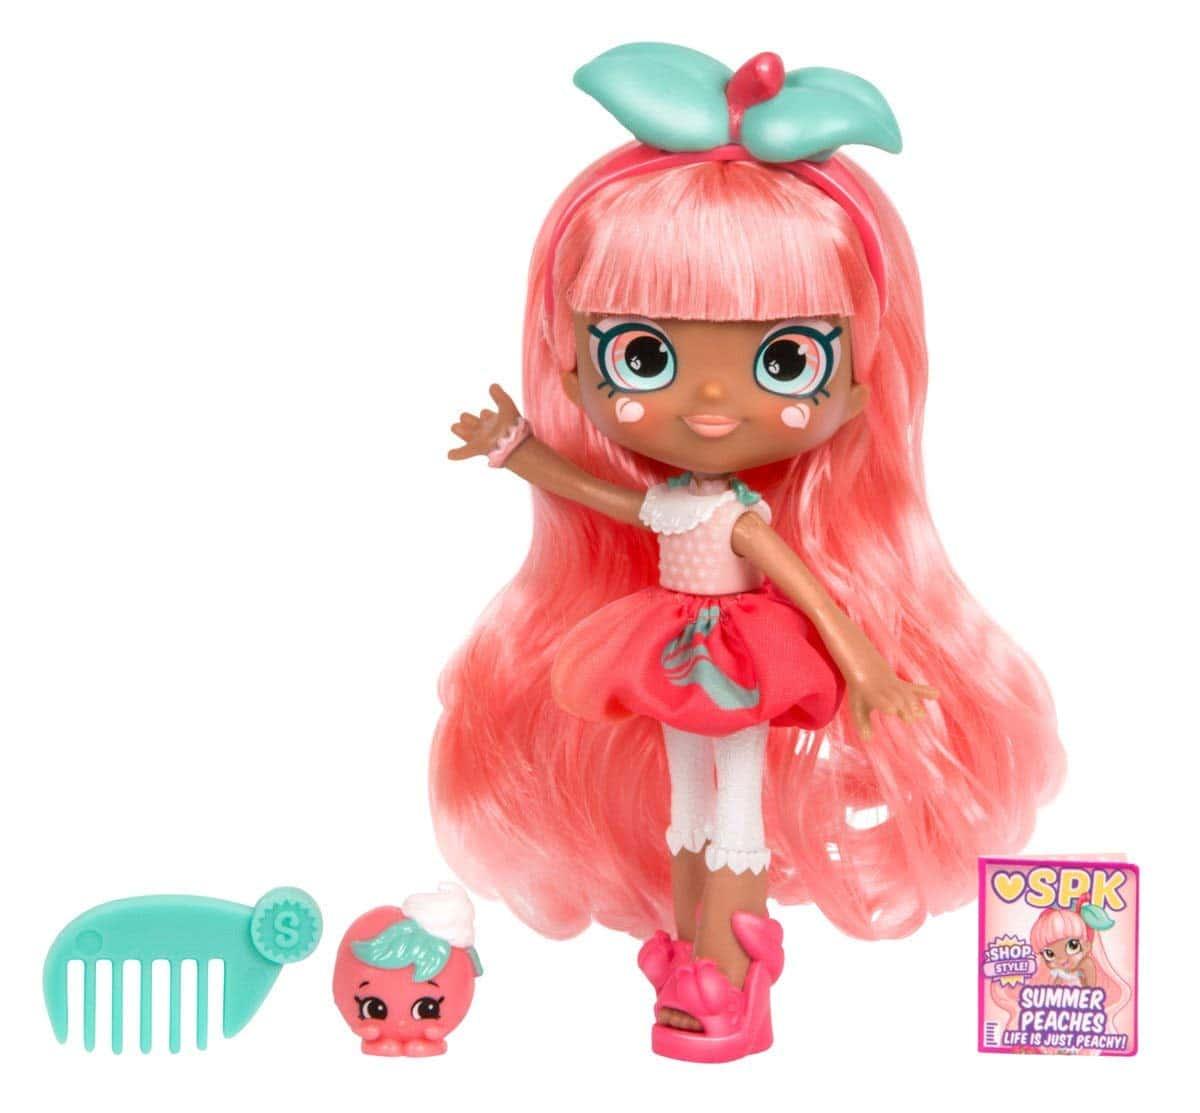 Shopkins Shoppies Shop Style Doll Guide Lotta LOL